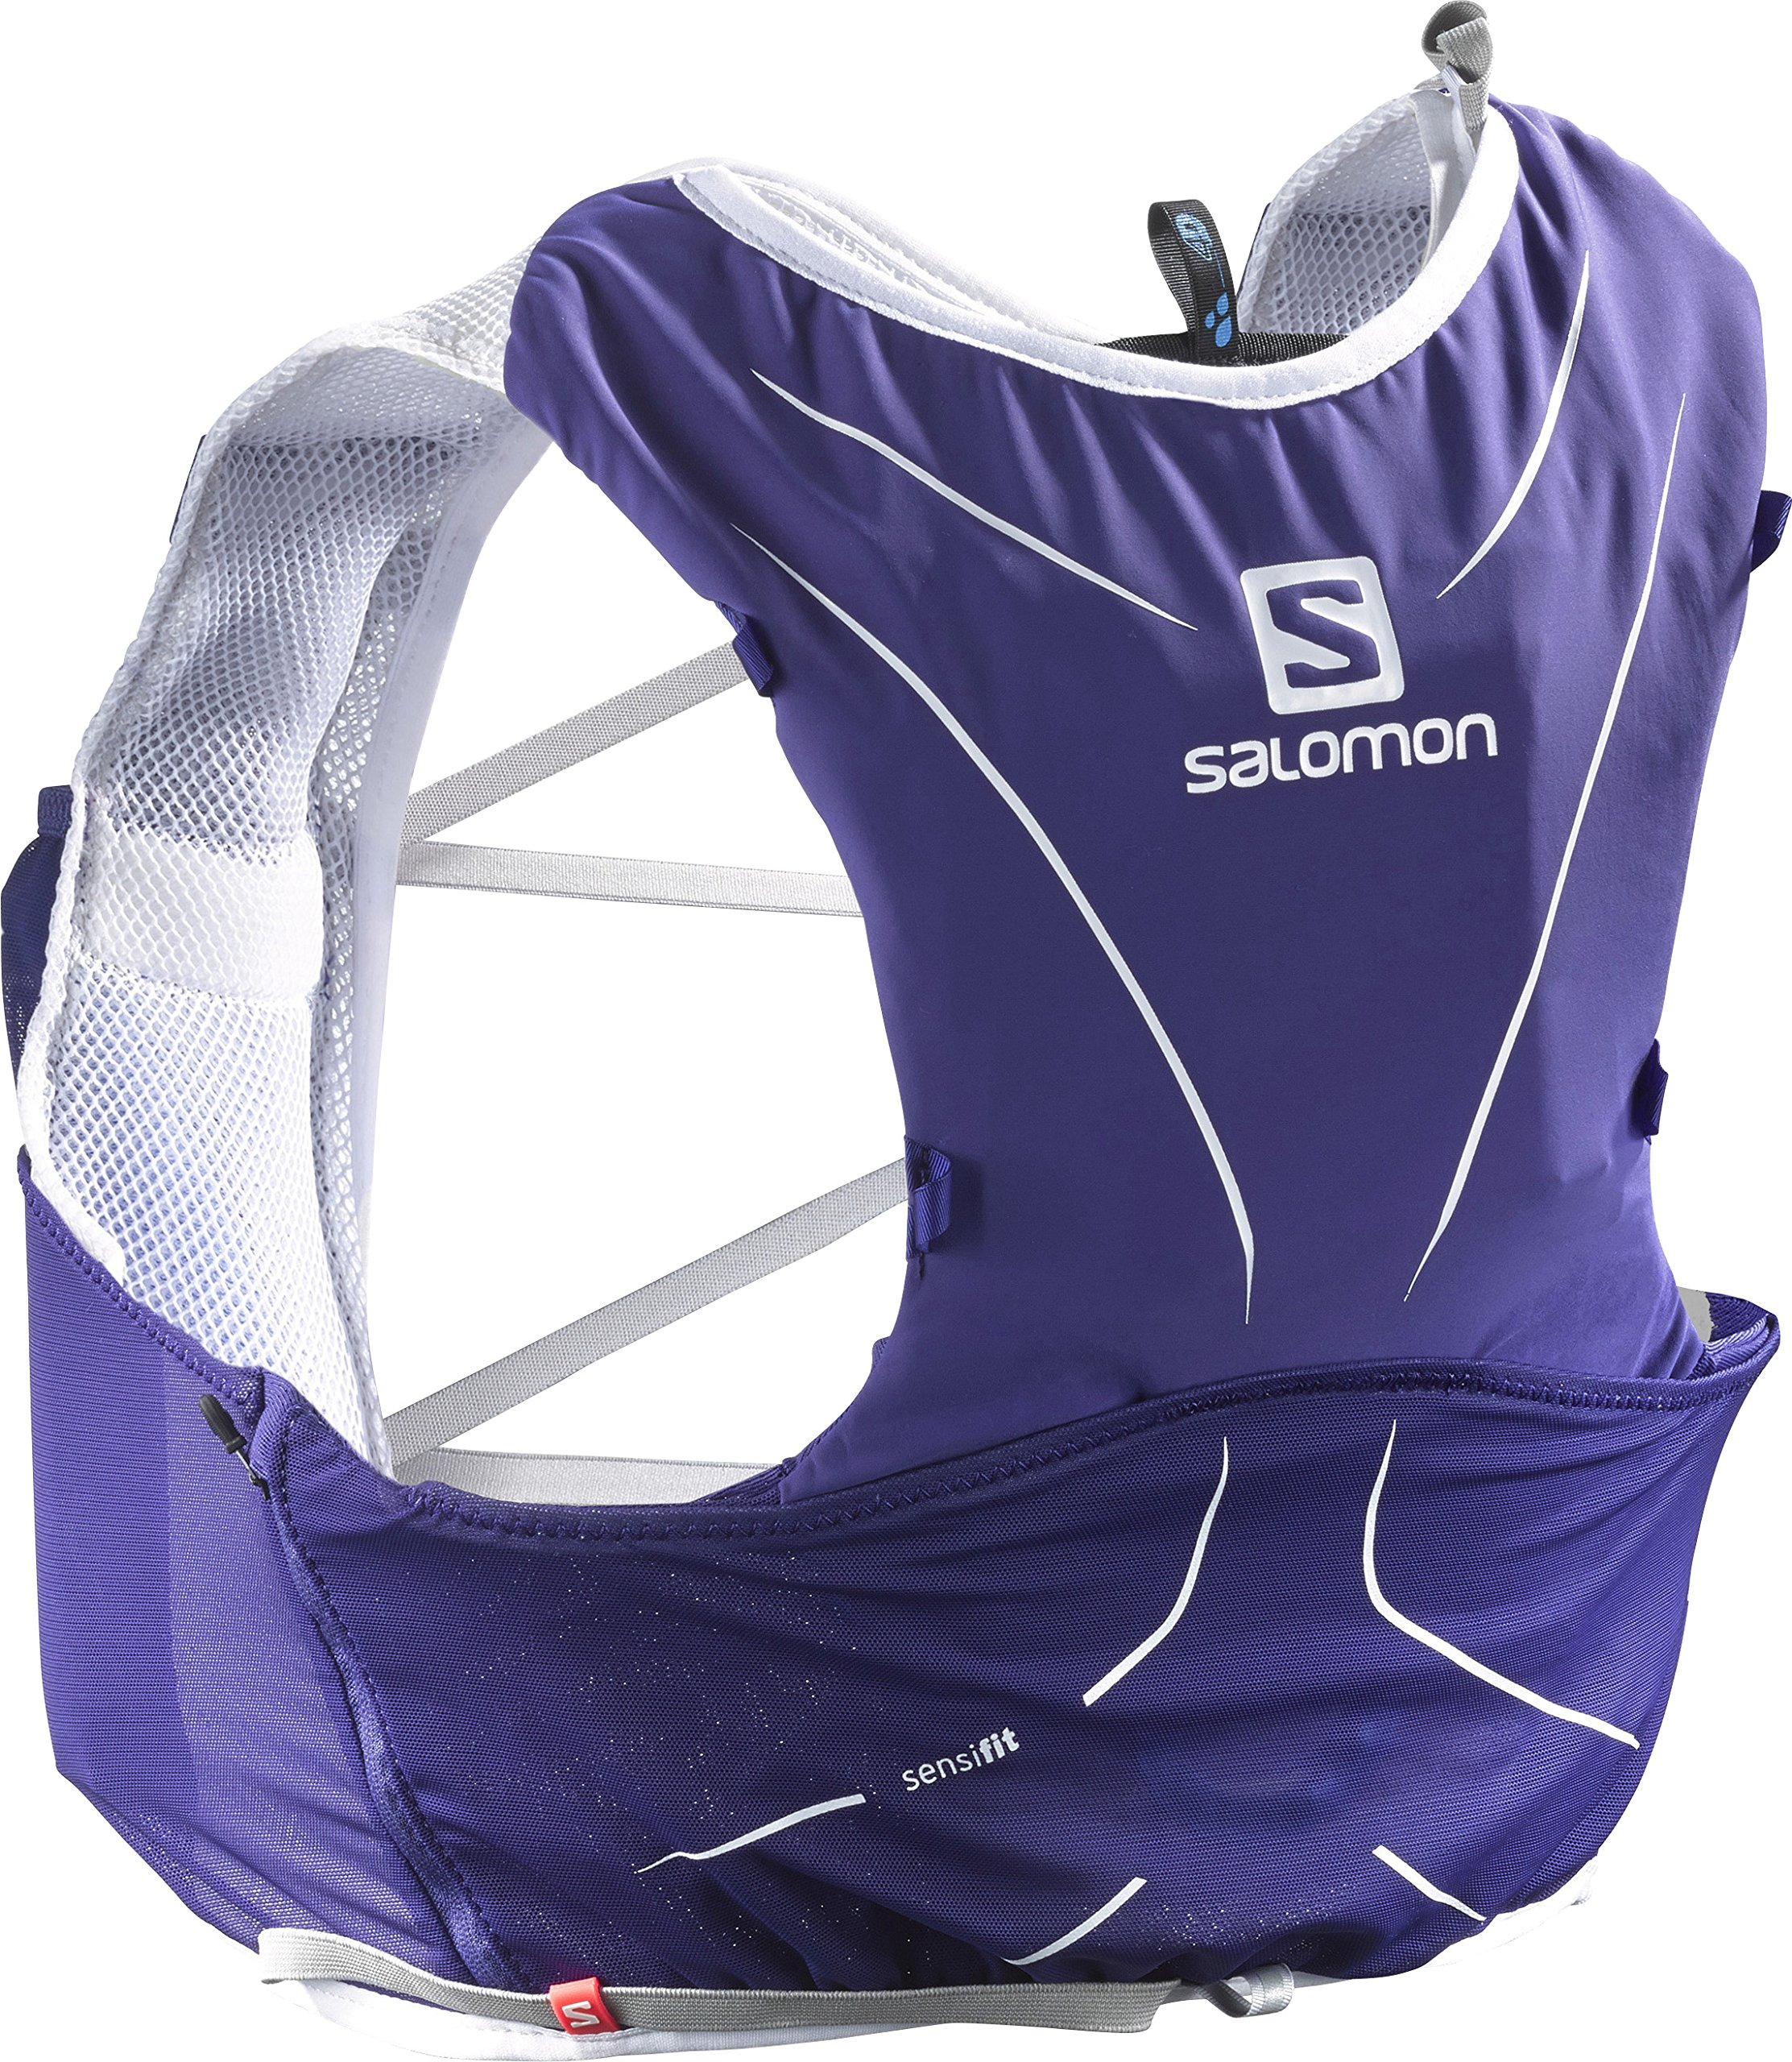 Salomon Salomon ADV SKIN 5 SET Sports Water Bottles, Spectrum Blue/White, X-Small/Small